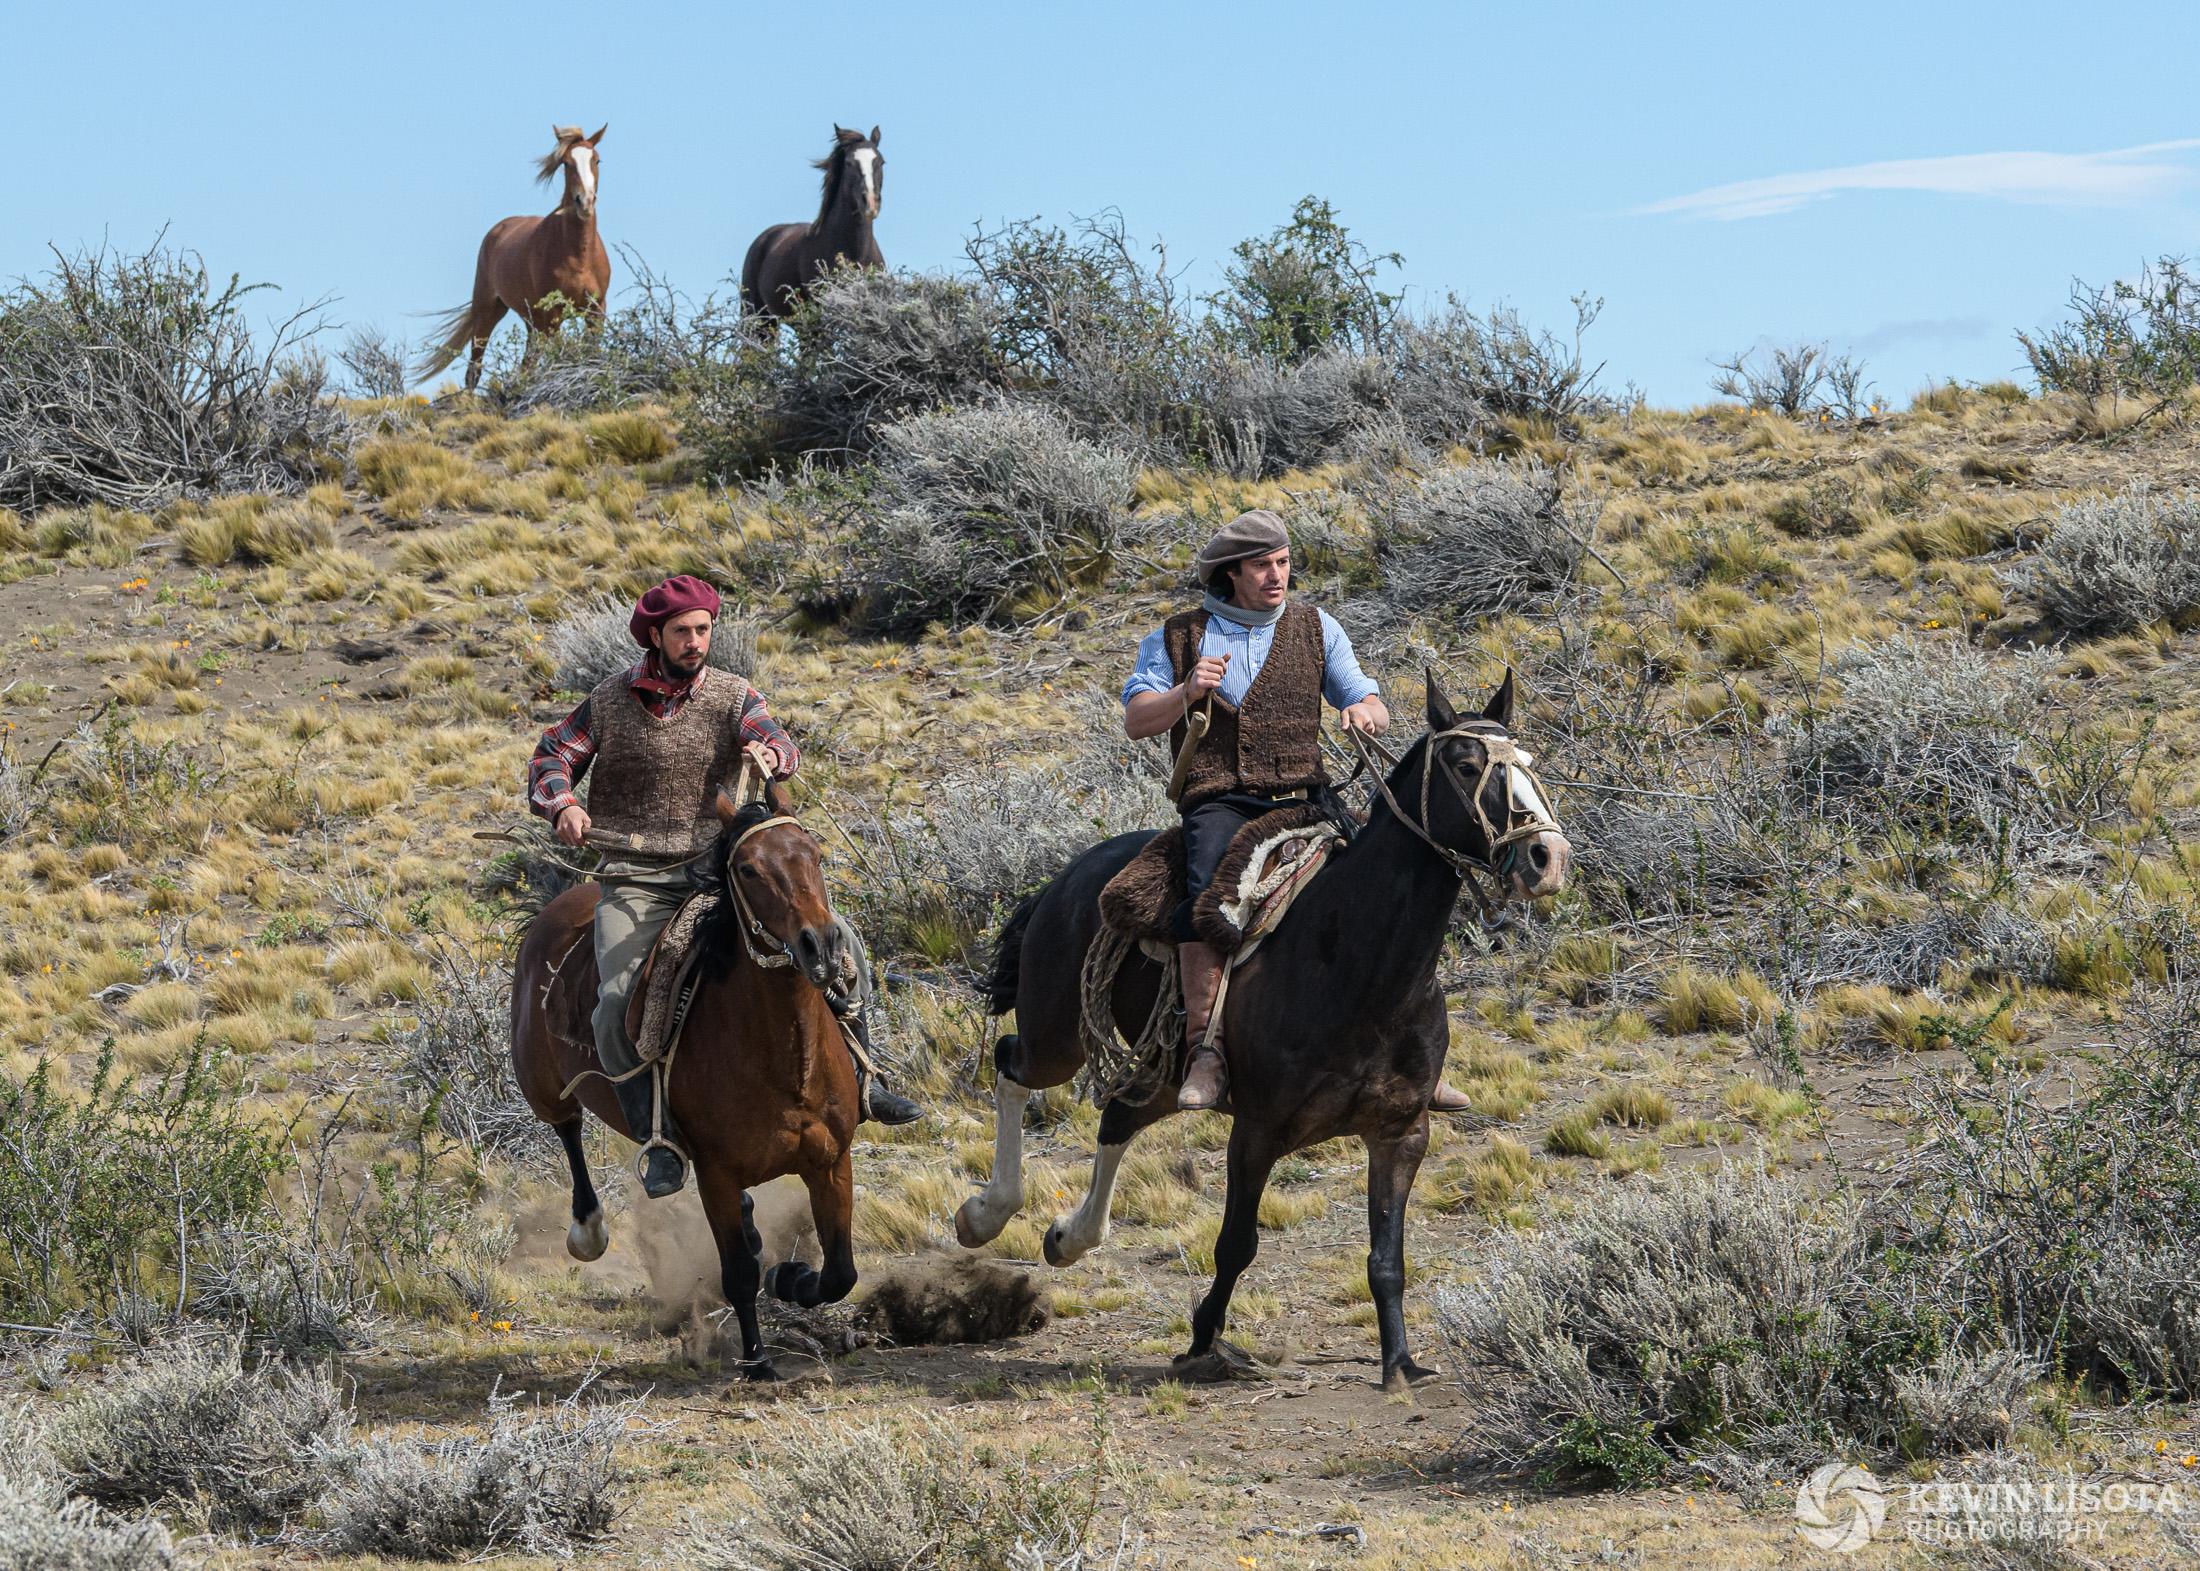 Gauchos gallop on horseback